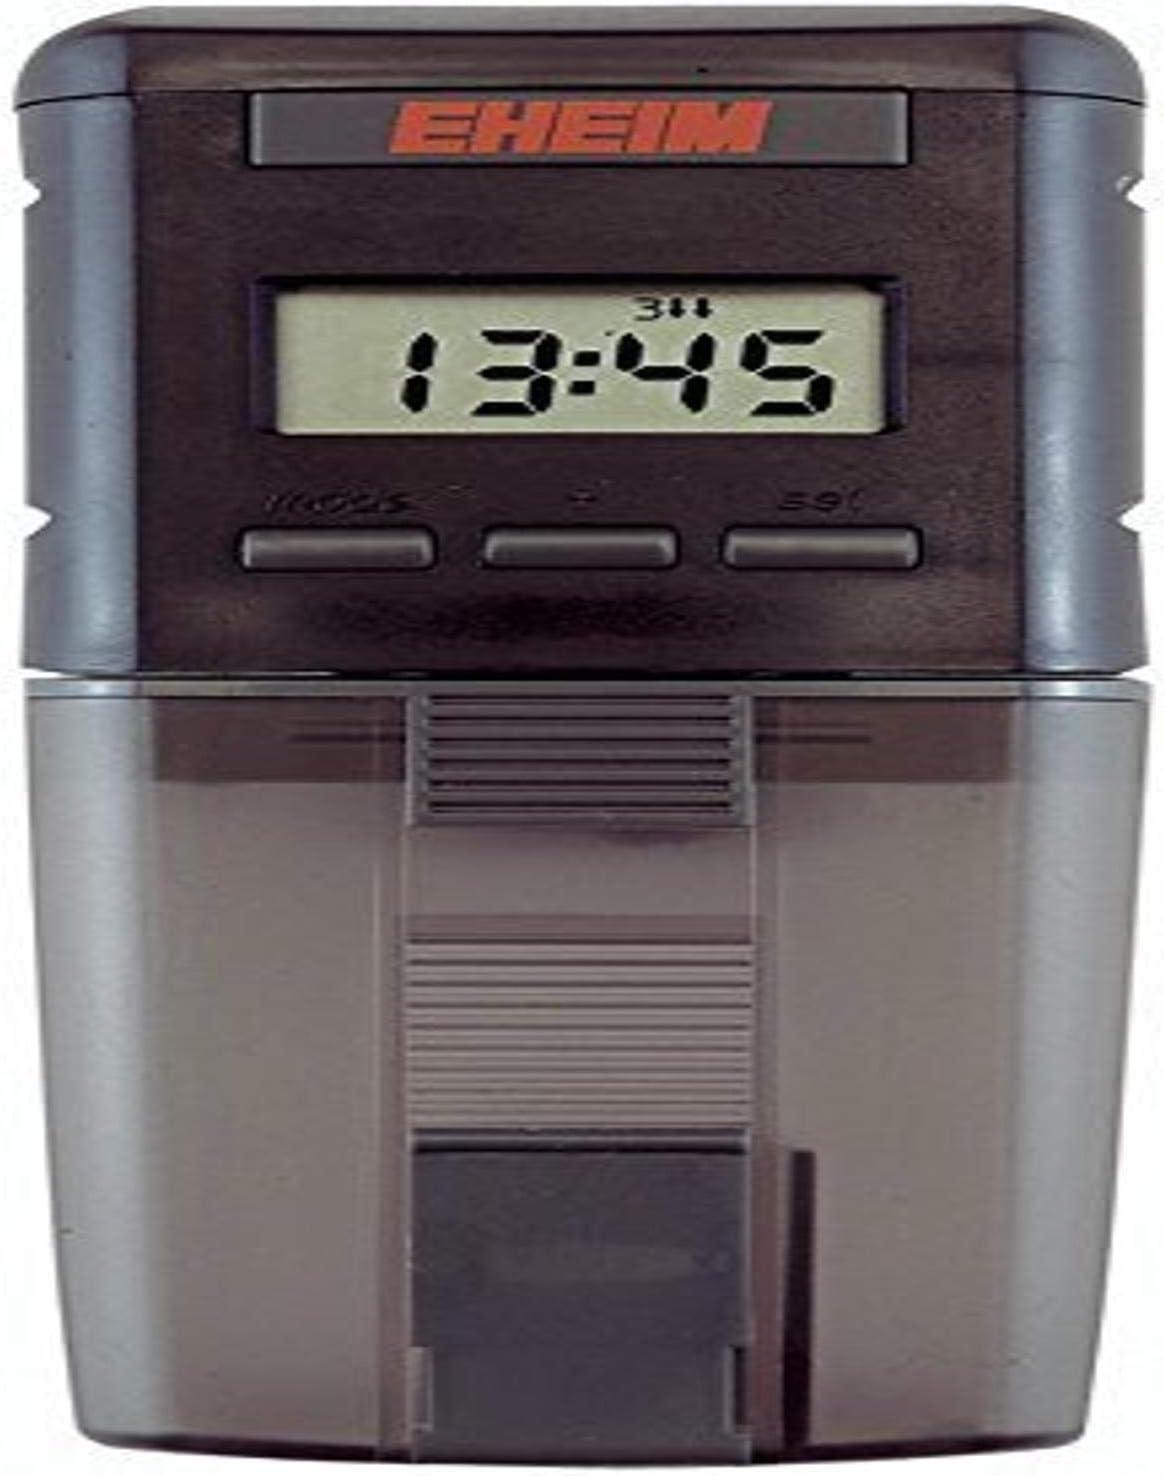 Eheim Everyday Fish Feeder Programmable Automatic0 Food Dispenser Amazon Co Uk Kitchen Home